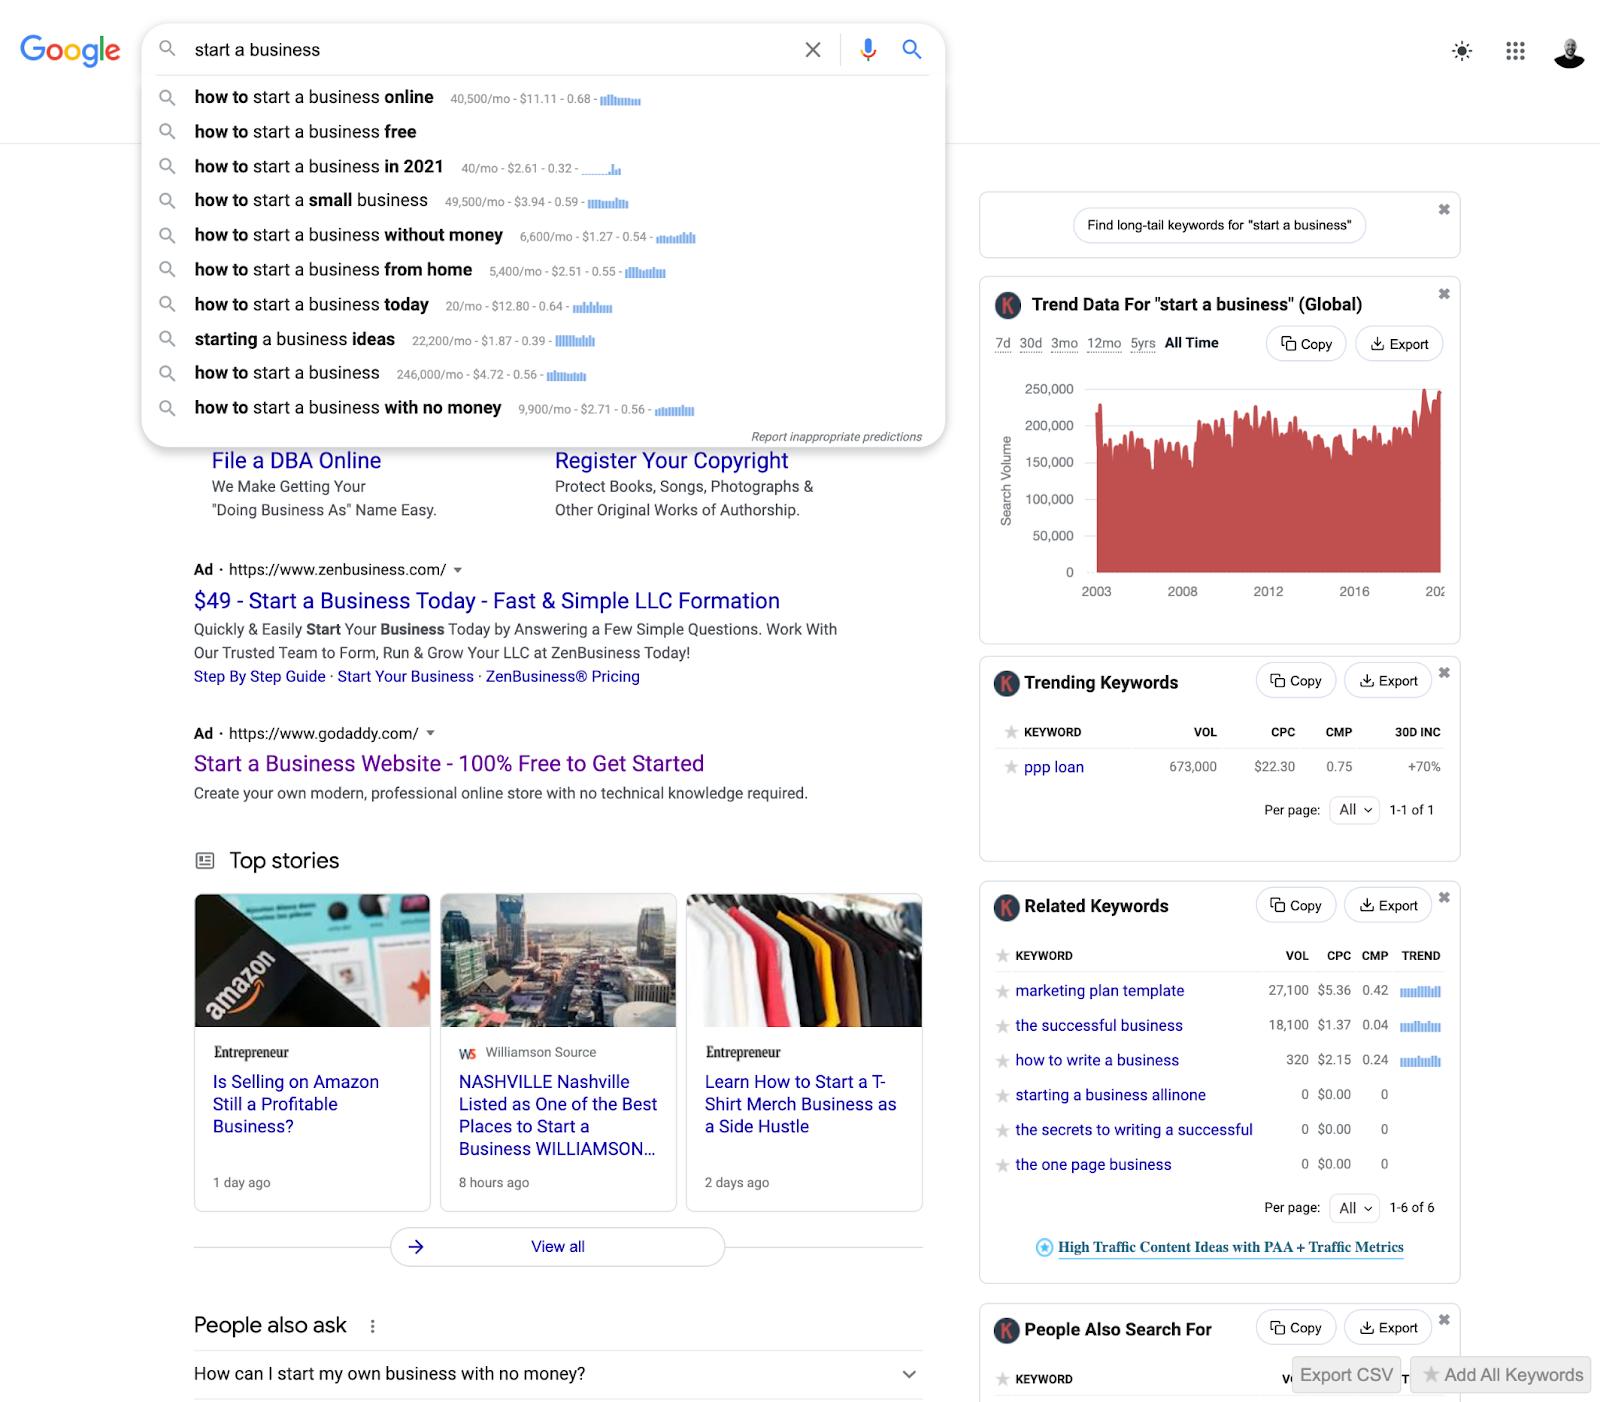 best keyword research tool for freelance writers - keywords everywhere